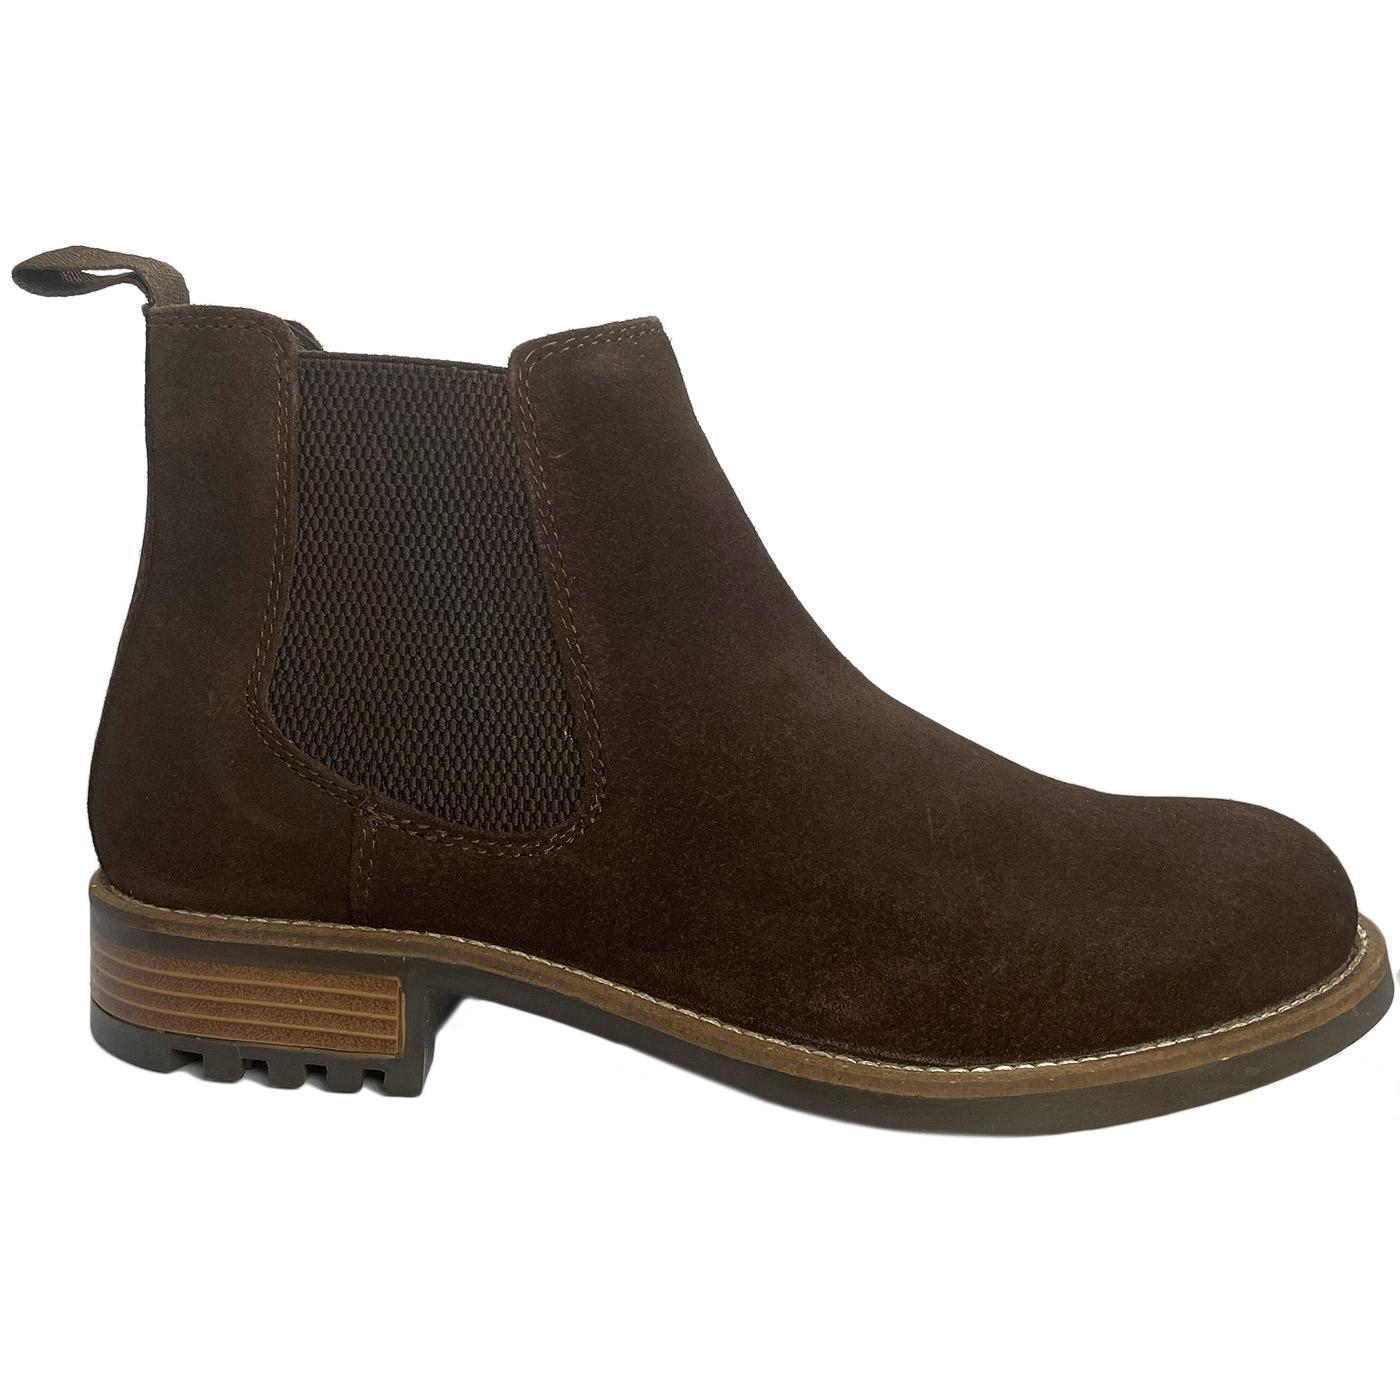 Men's Retro Mod Suede Chelsea Boots (Dark Brown)